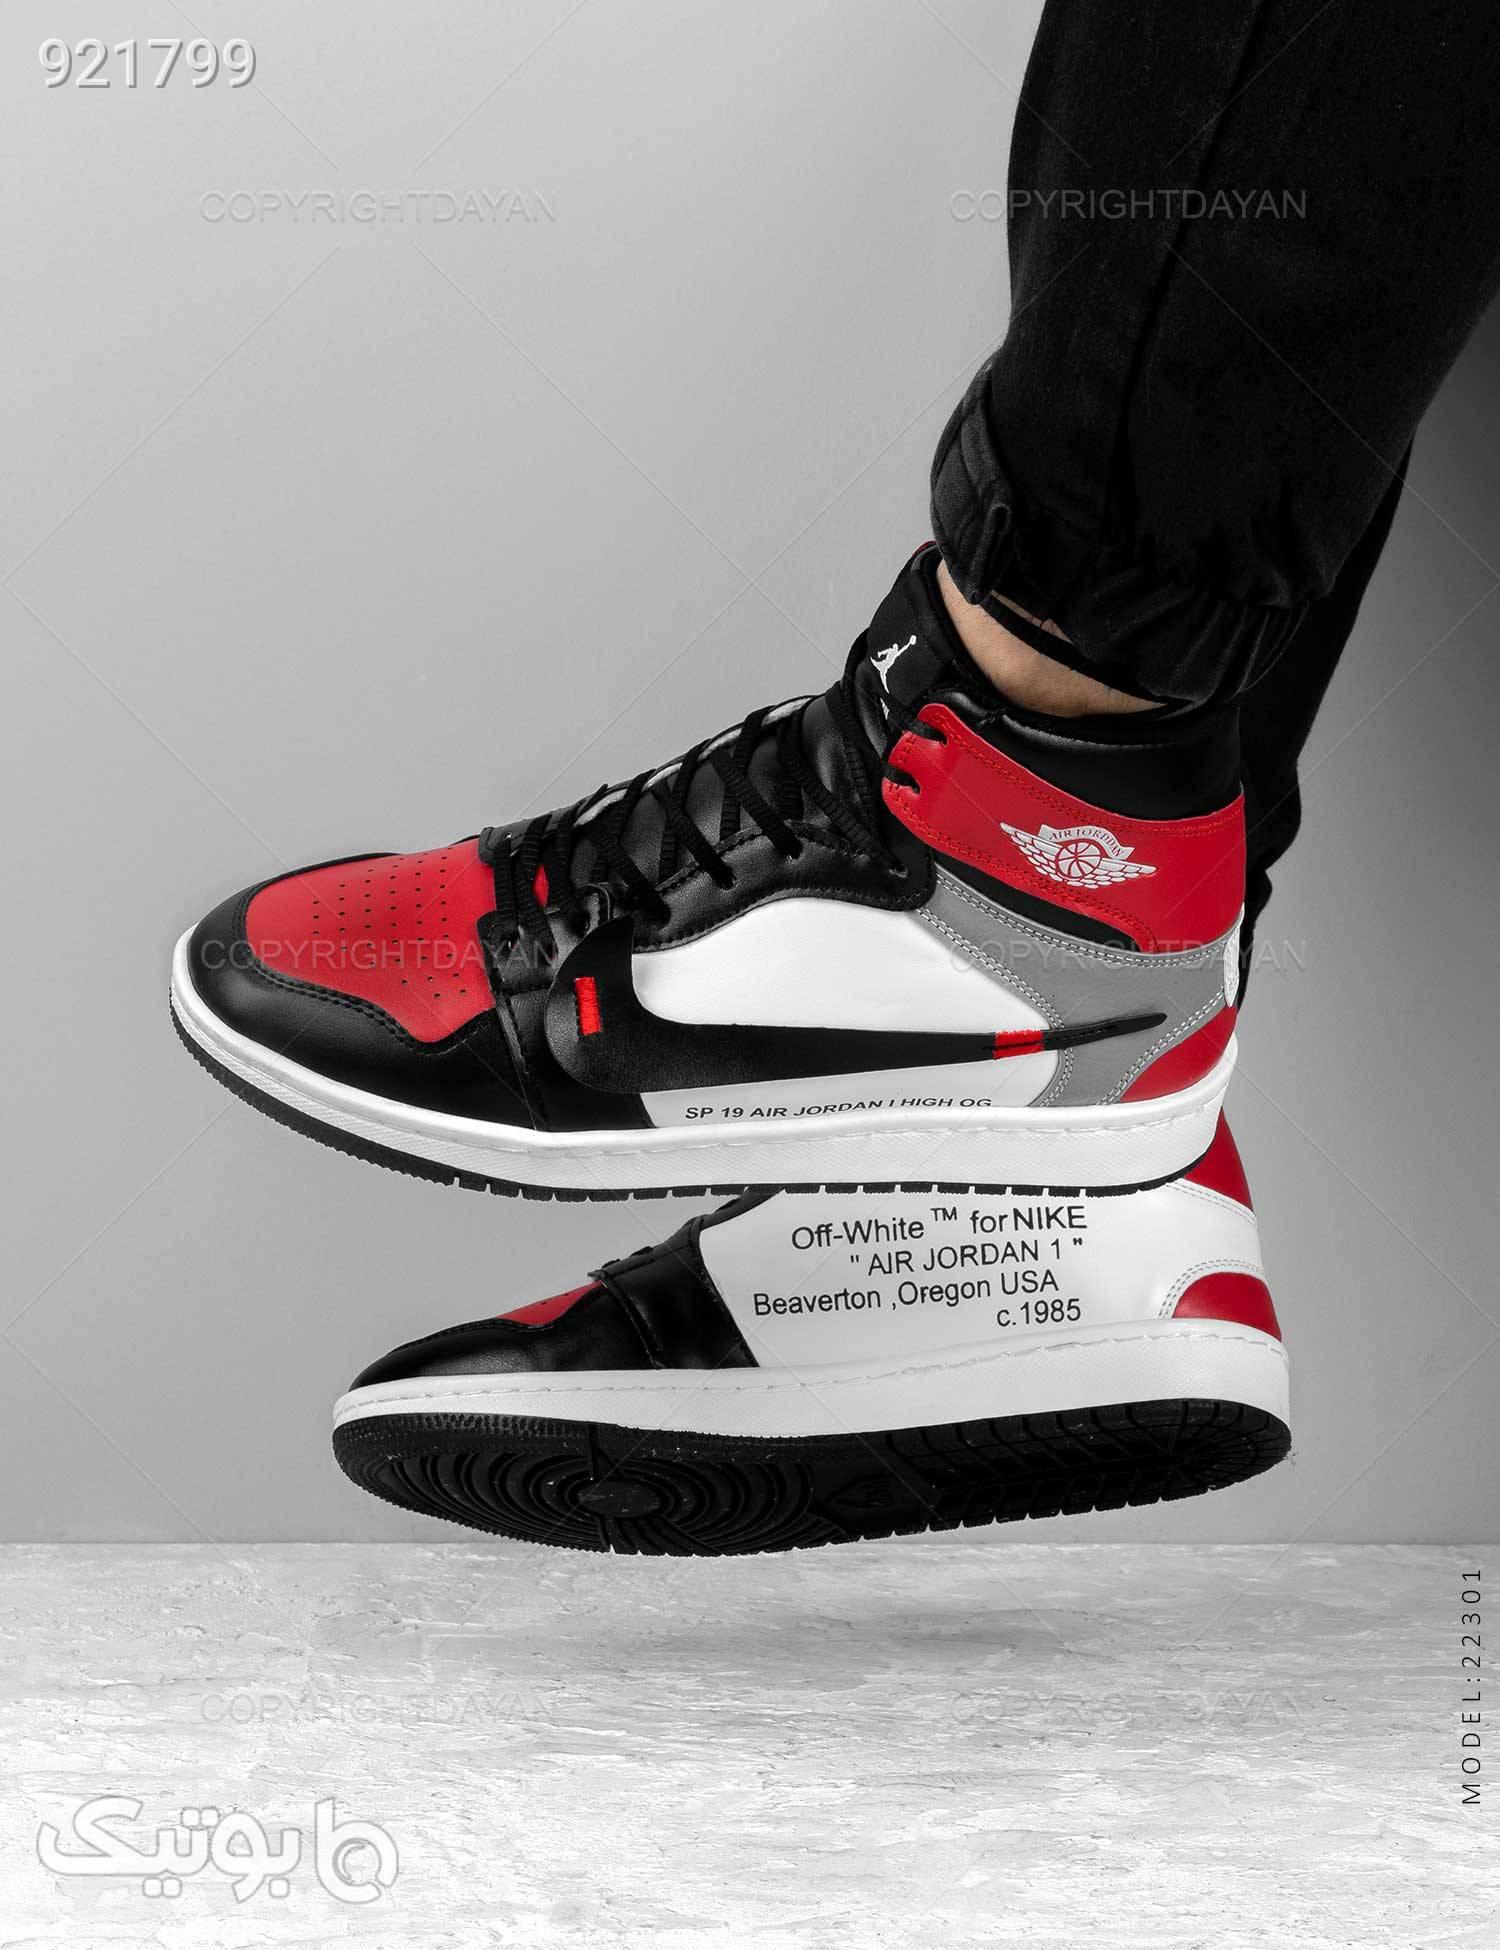 کفش ساقدار مردانه Jordan مدل 22301 مشکی كفش مردانه